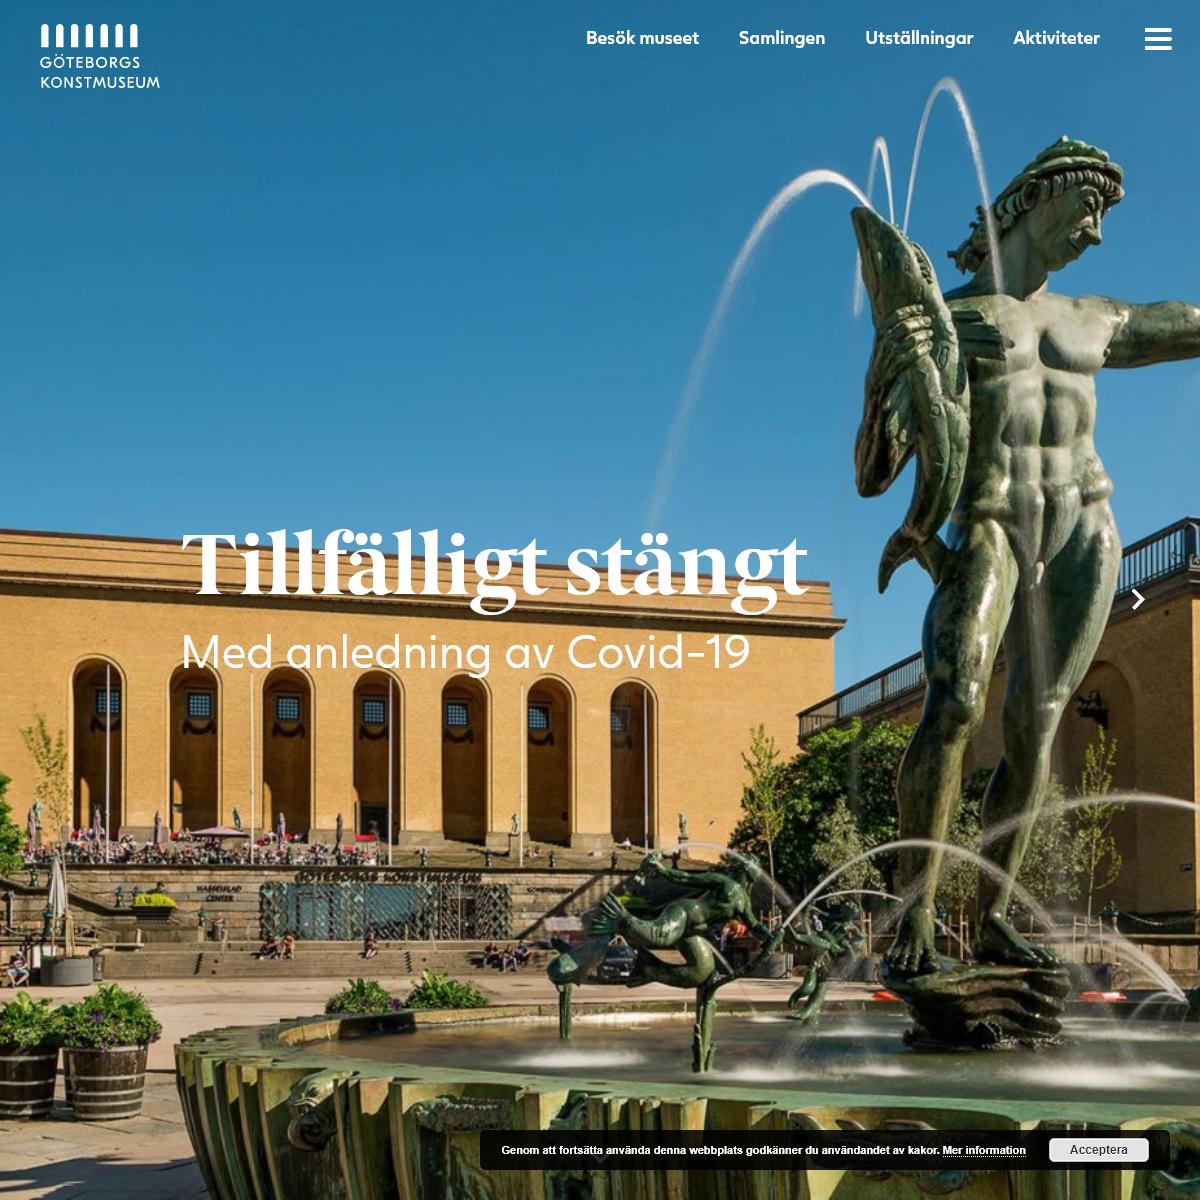 Göteborgs konstmuseum